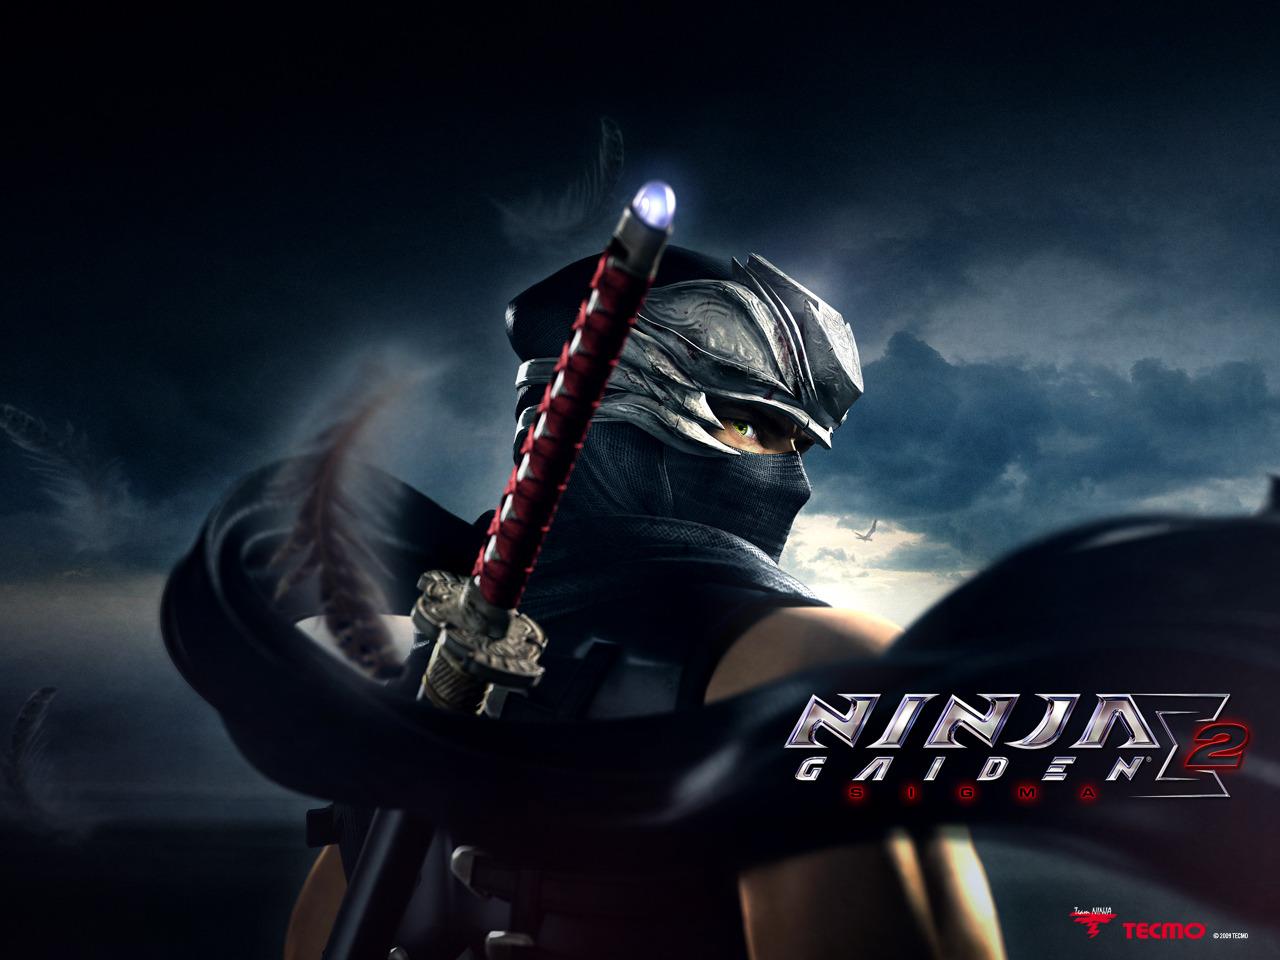 New Ninja Gaiden Sigma 2 Wallpaper | Me-Wallpaper